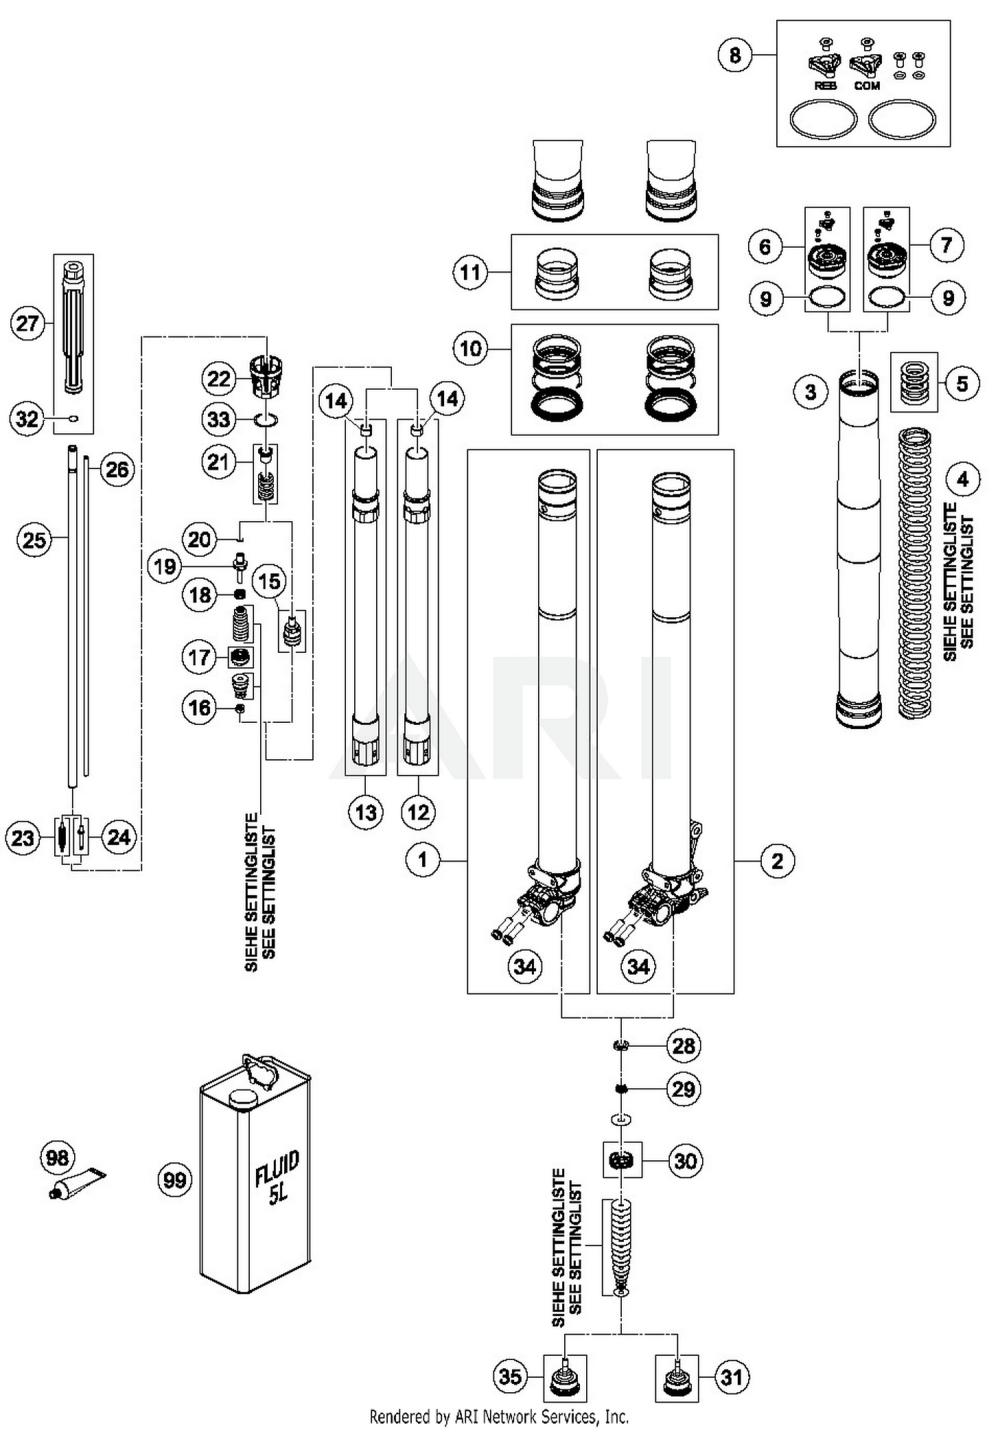 medium resolution of 2019 ktm 300 xc w tpi front fork disassembled 15 parts best oem megasquirt wiring diagram ktm 300 tpi wiring diagram